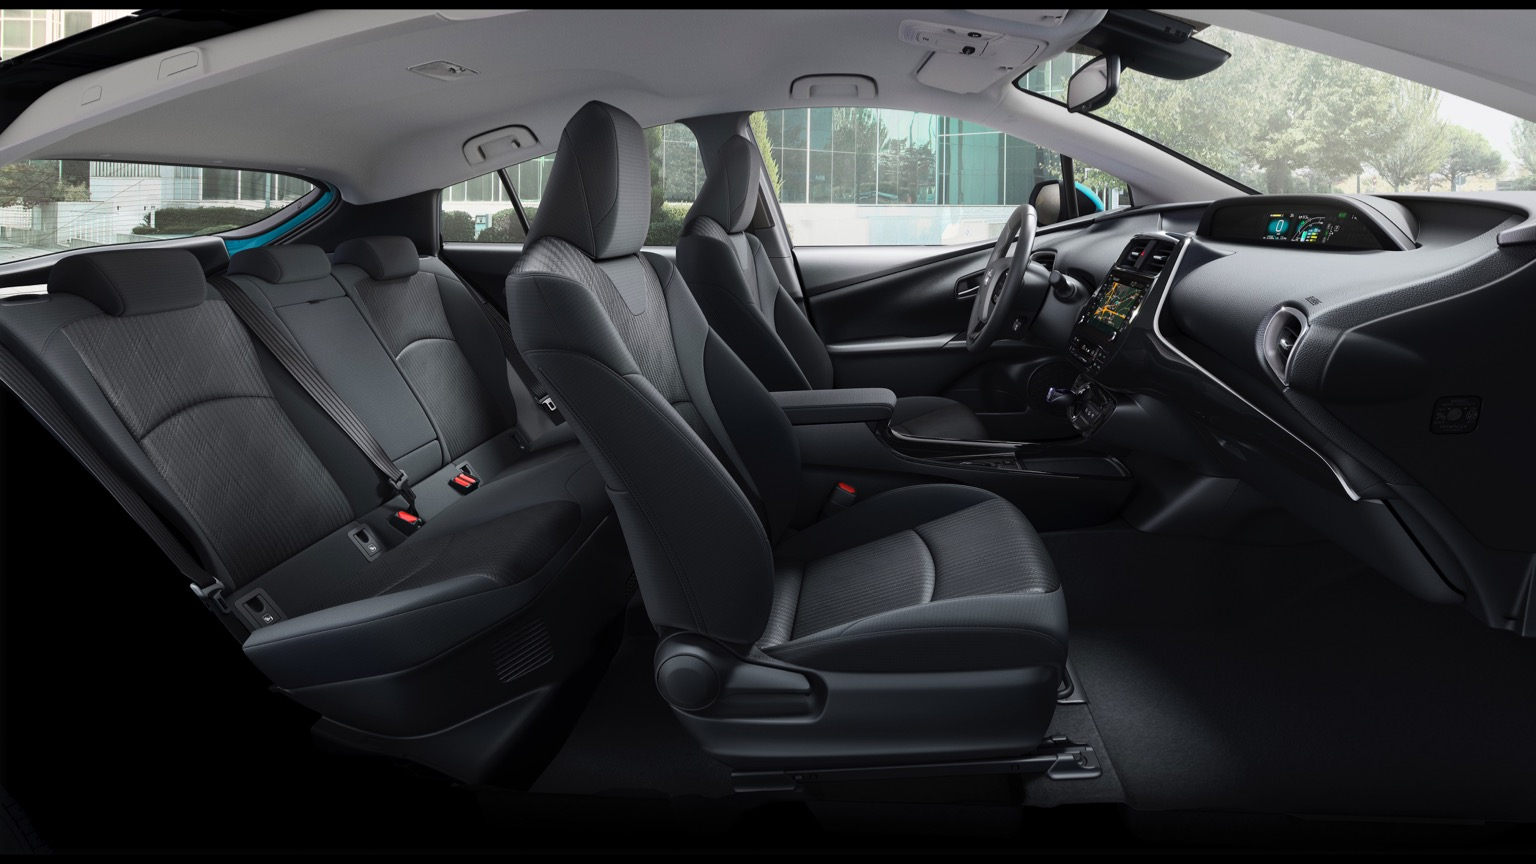 Toyota_Prius_Plug-in_Hybrid-2019-04@2x